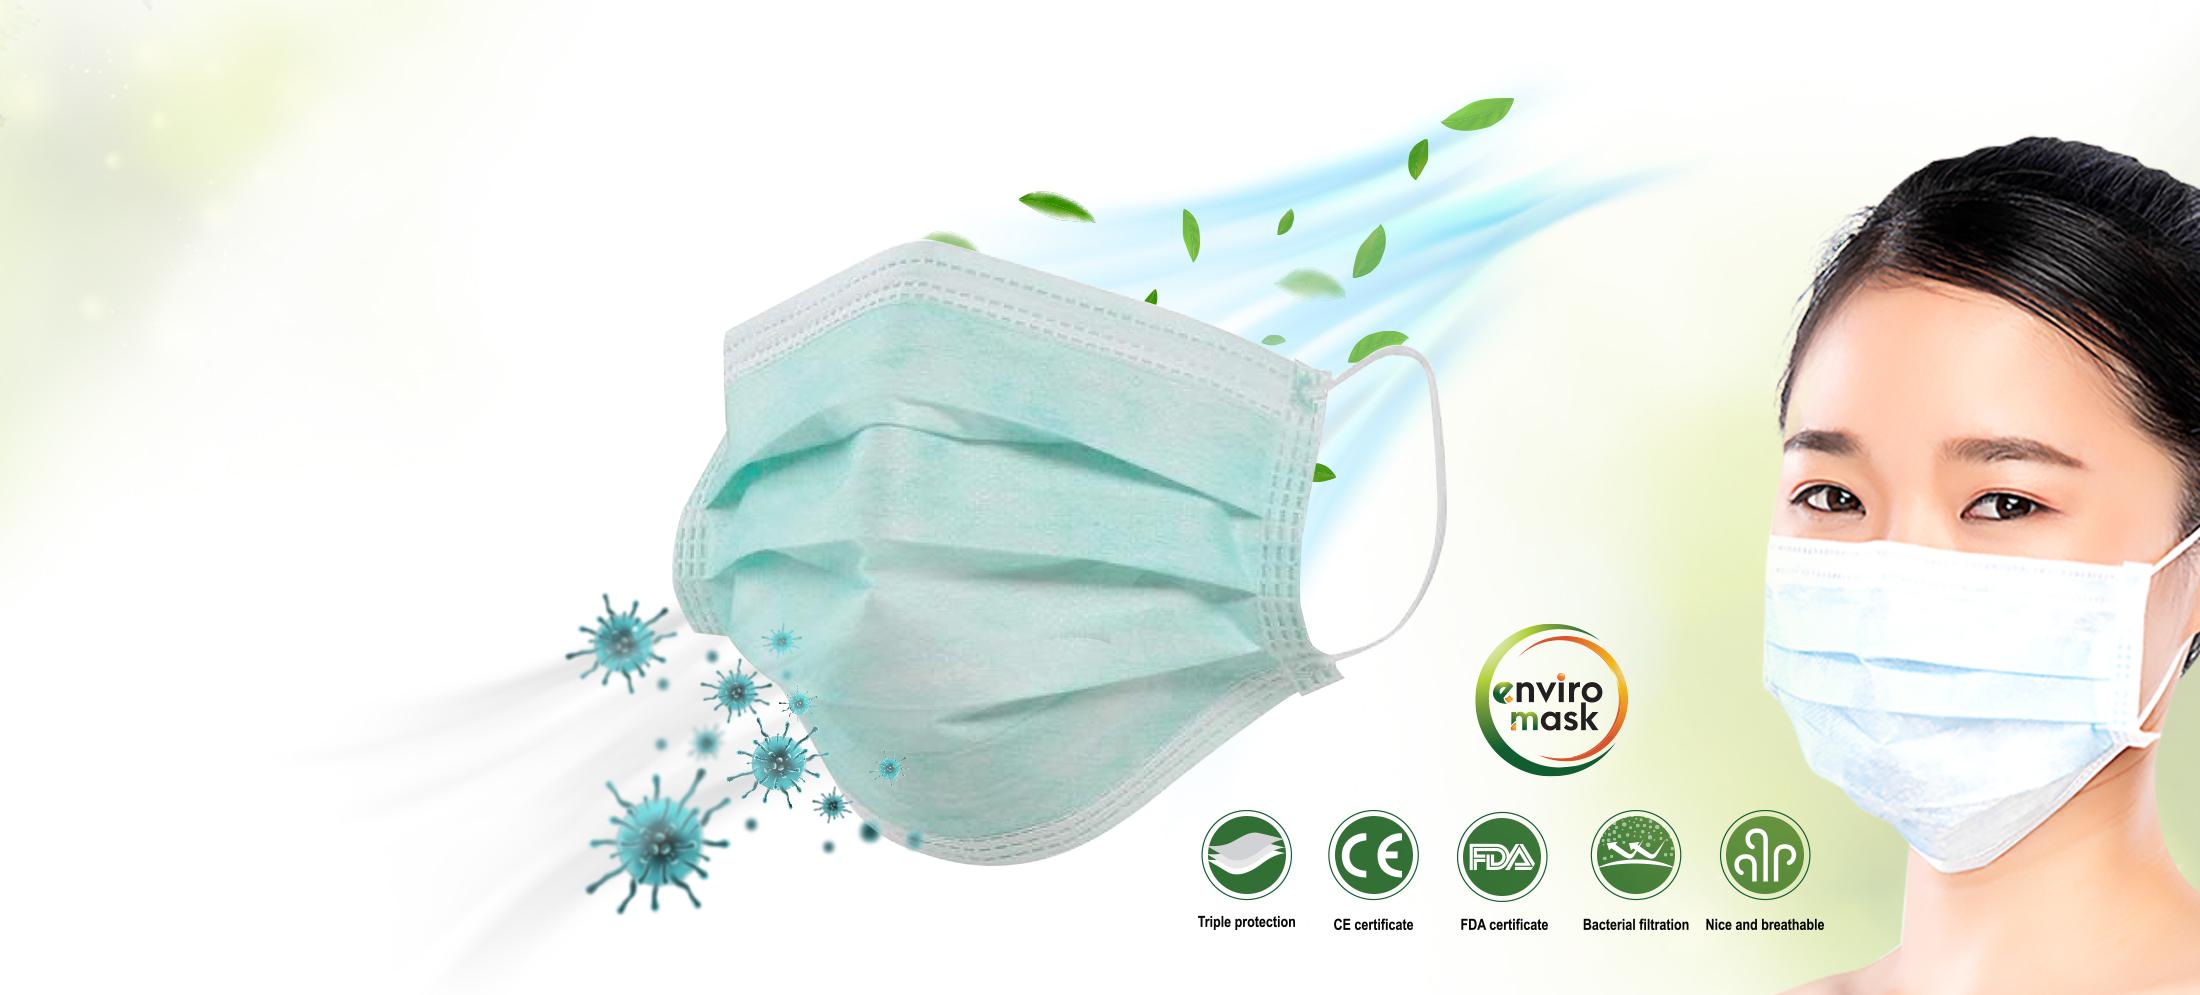 Enviro Group Store | Enviro Mask